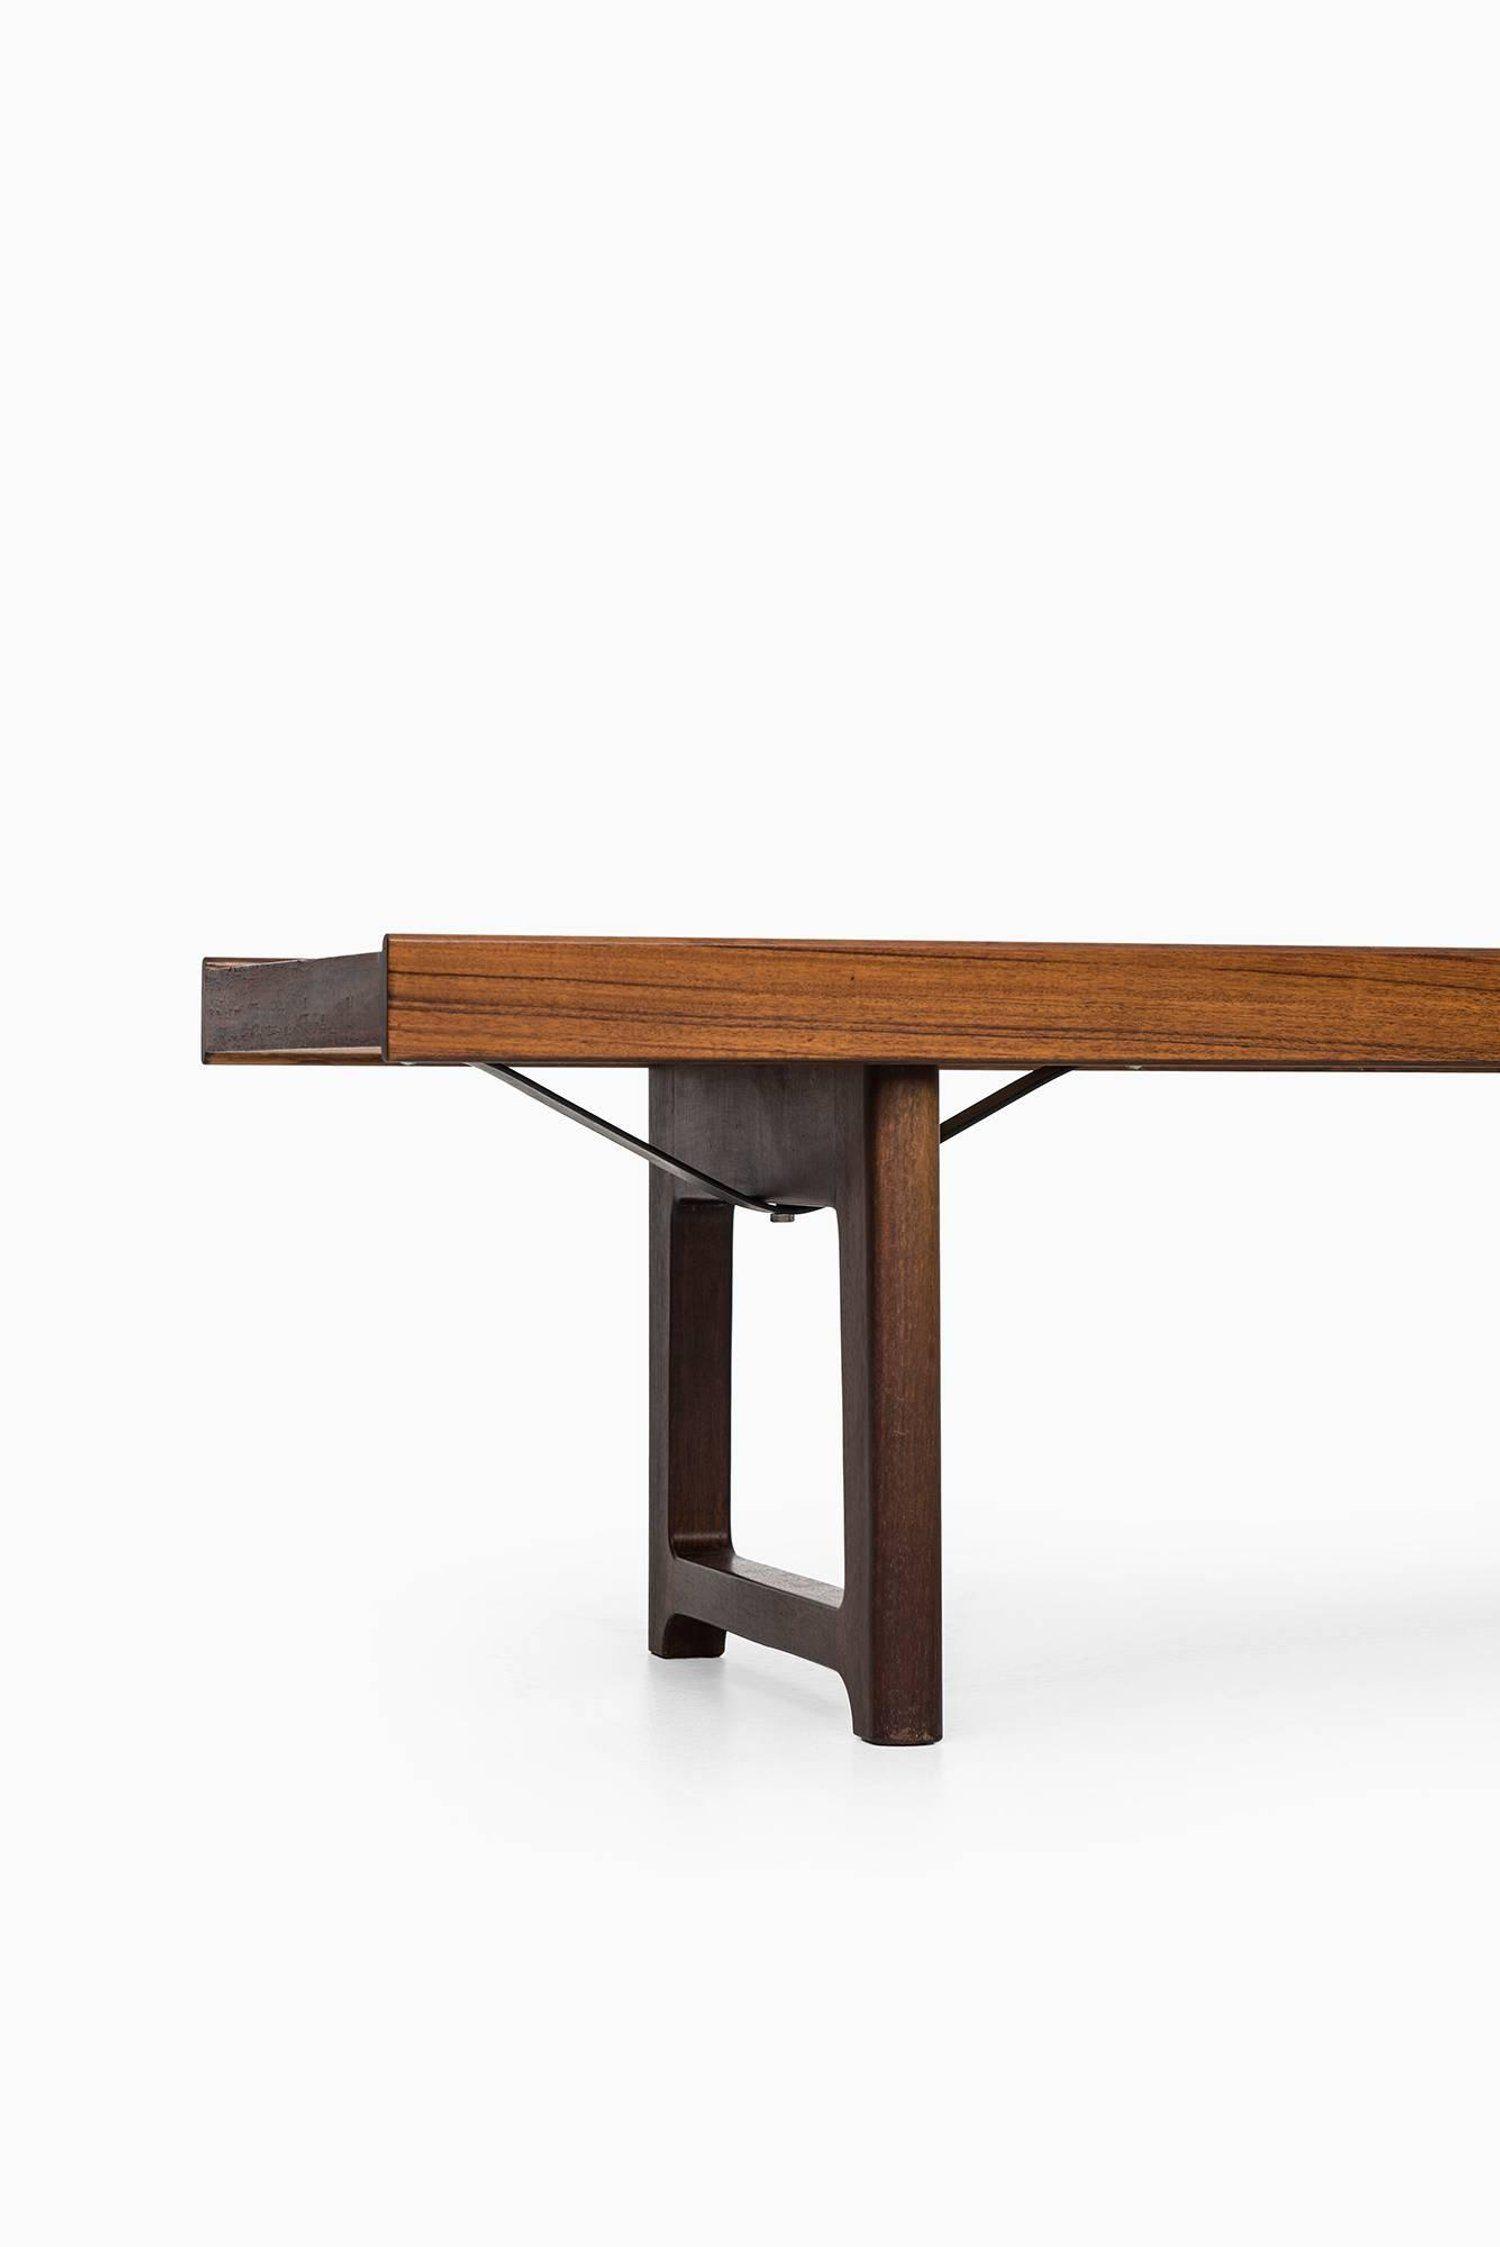 Bench Side Table Model Krobo Designed By Torbjorn Afdal Produced By Bruksbo Modern Side Table Furniture Coffee Table Bench [ 2247 x 1500 Pixel ]